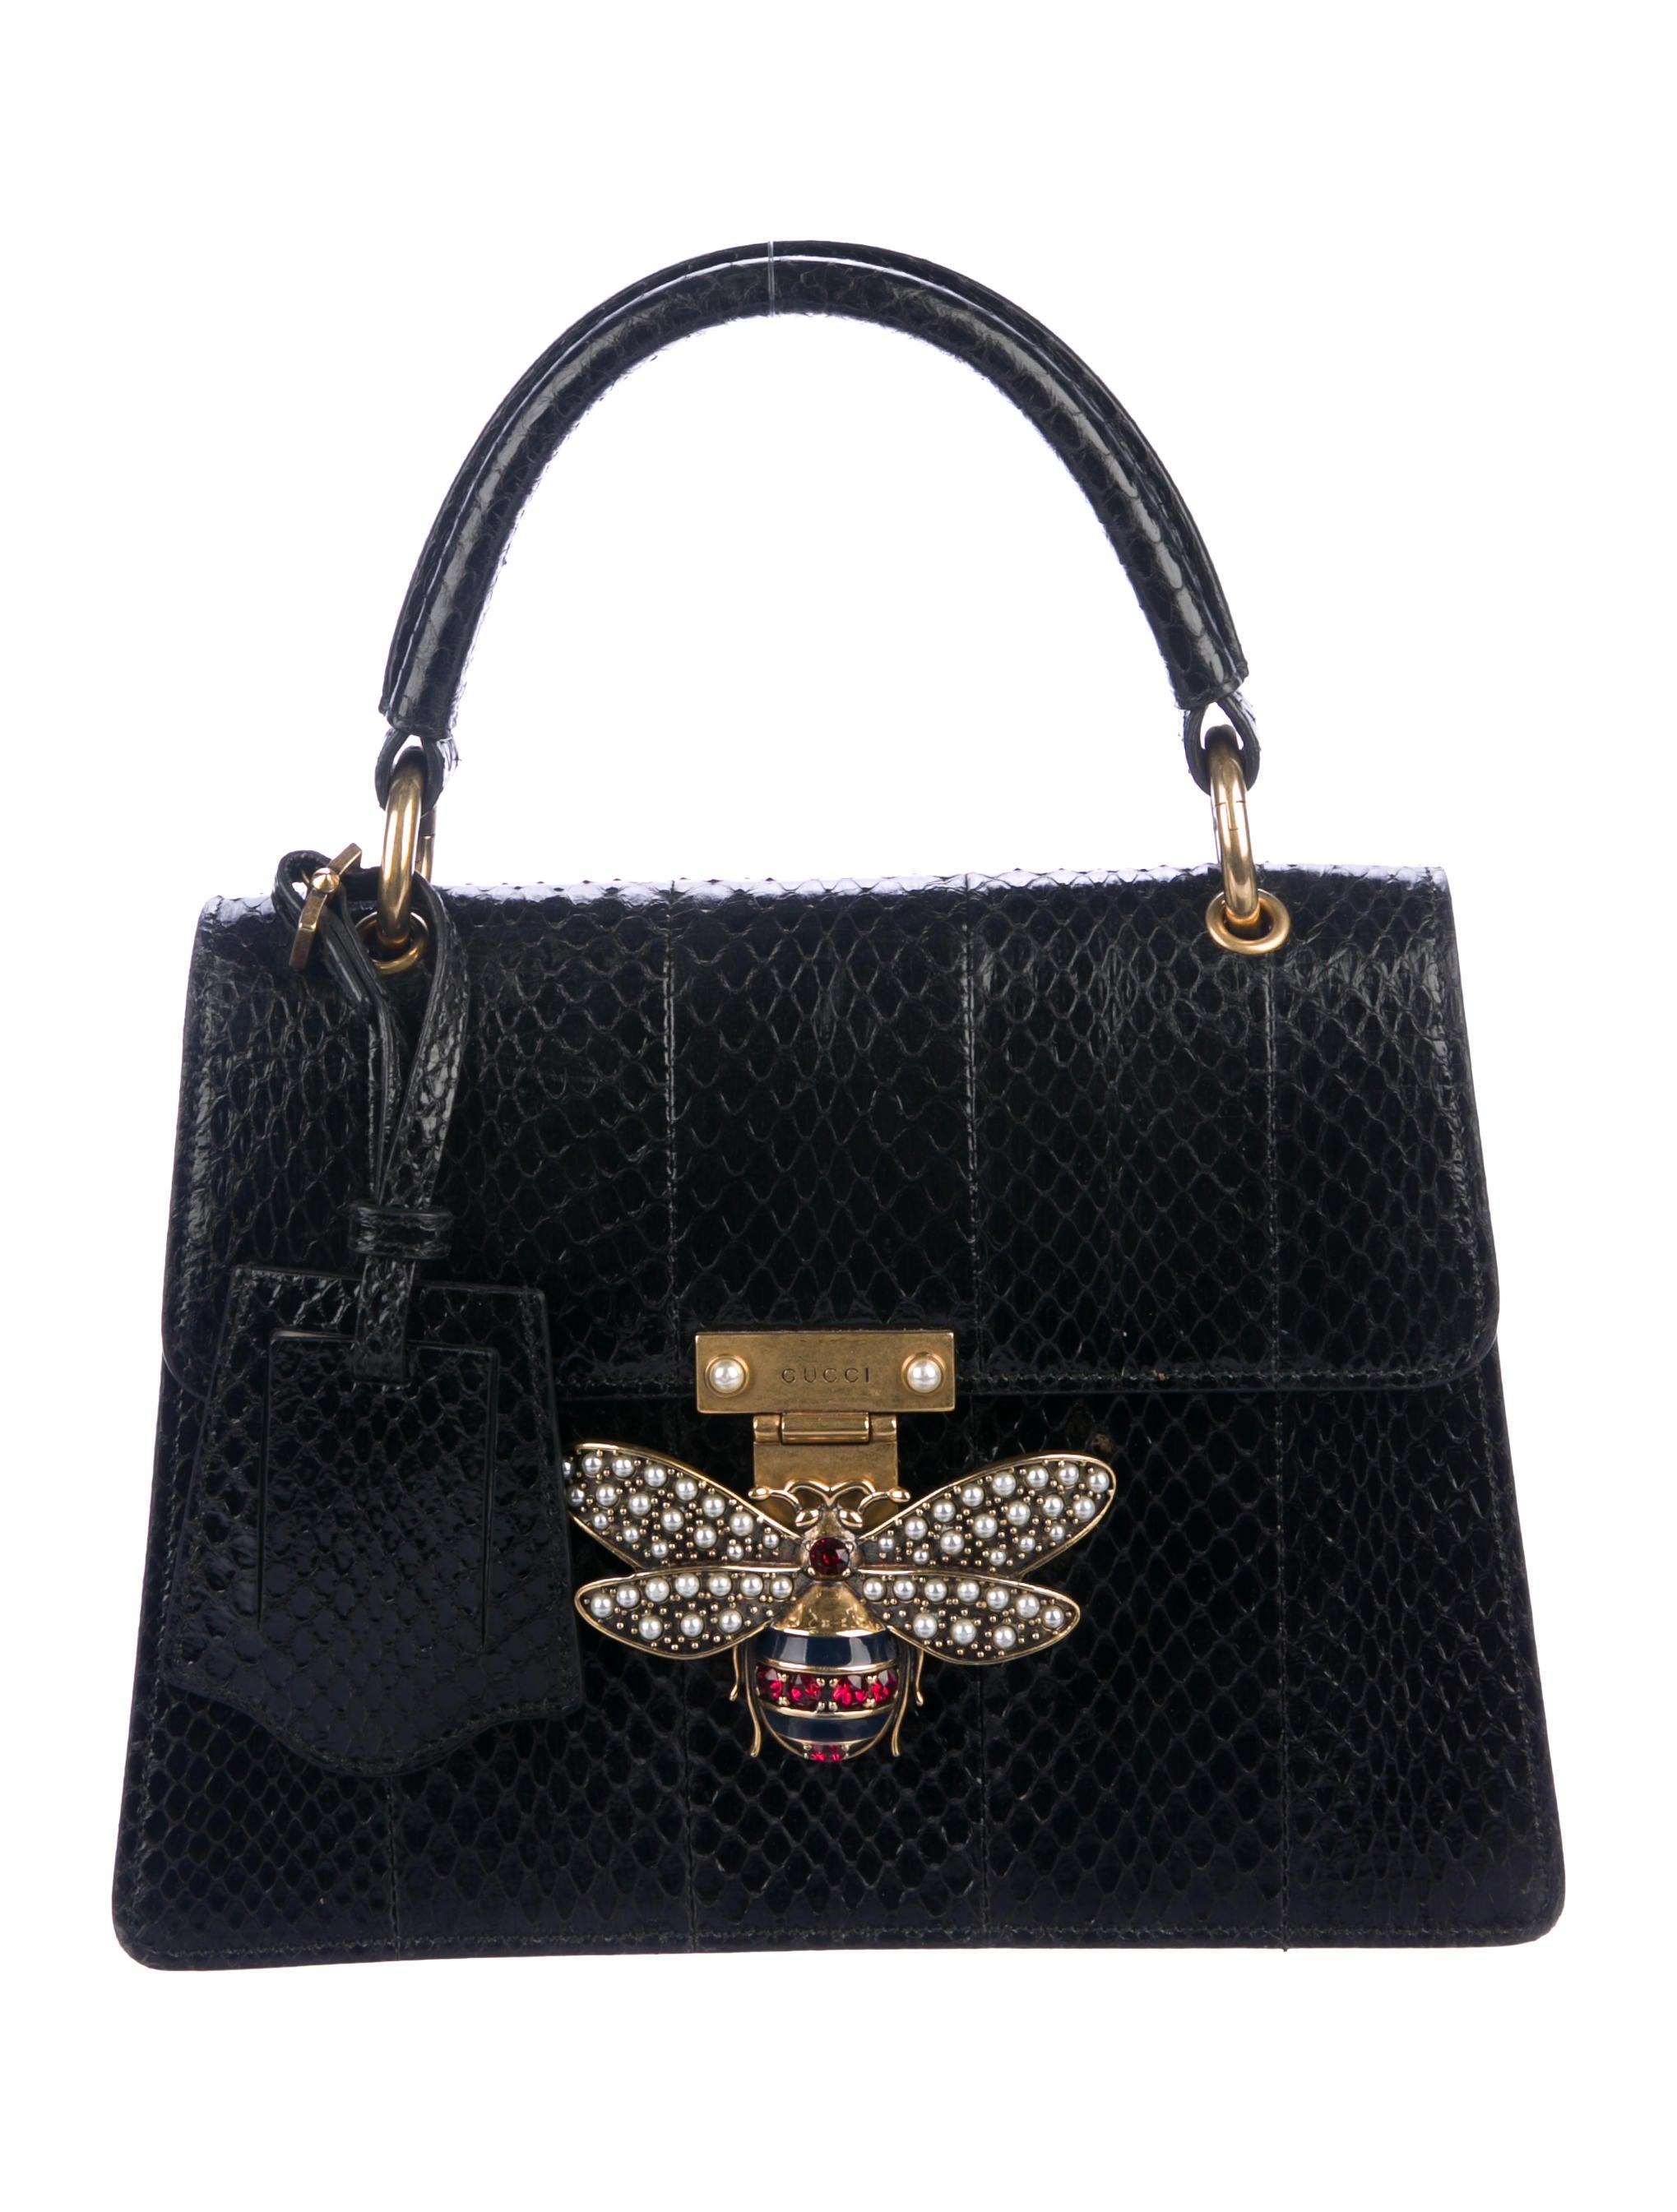 214ae2ca36f Gucci Small Python Queen Margaret Top Handle Bag - Handbags - GUC279332